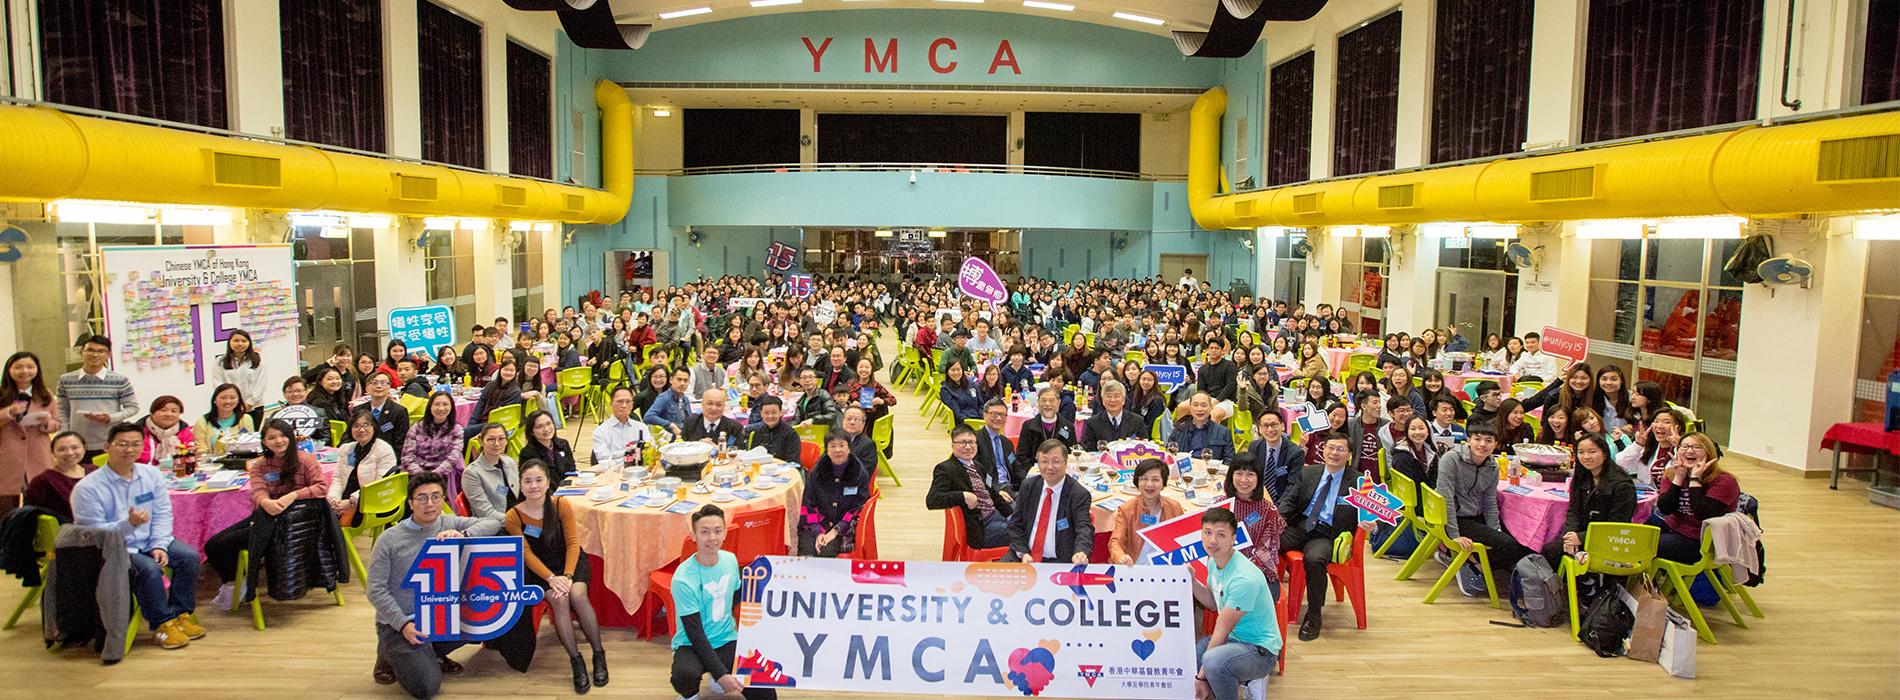 University & College YMCA 15th Anniversary Dinner